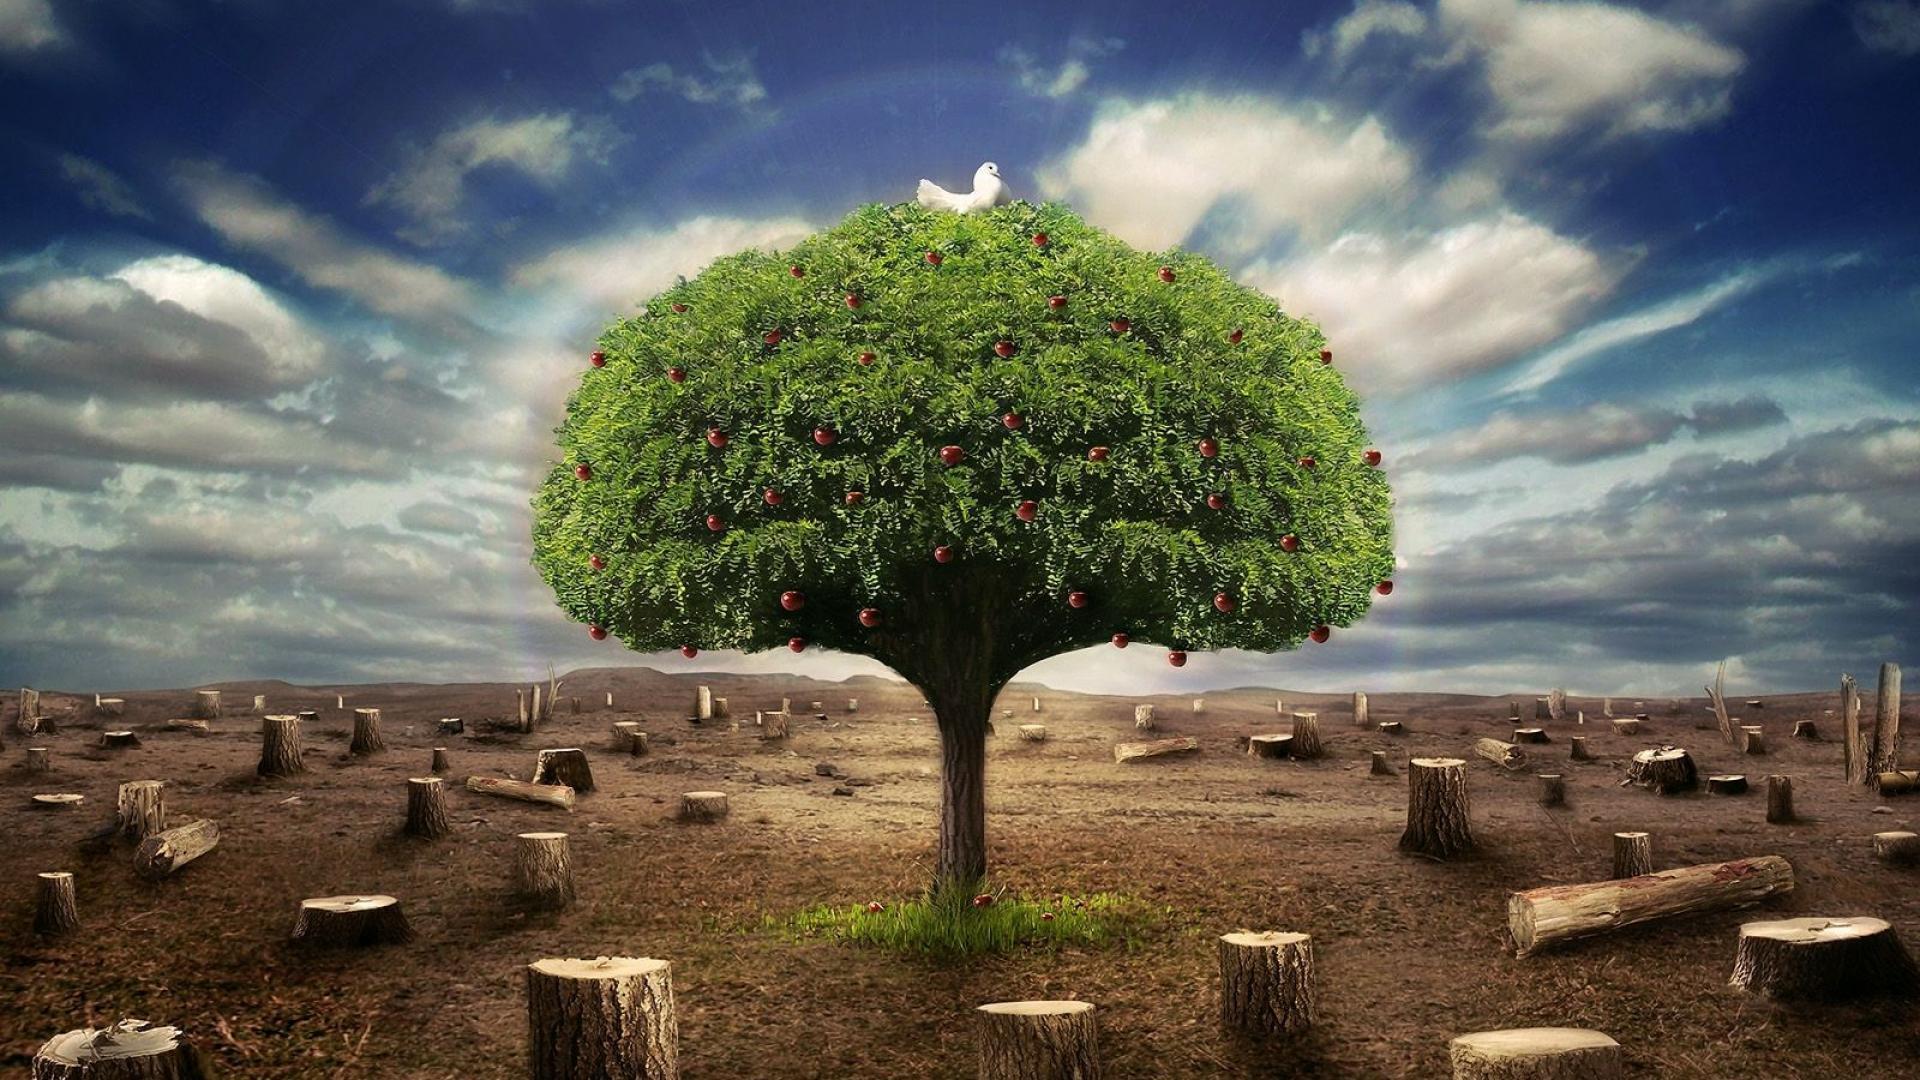 Tree Nature 3D Pictures HD Wallpaper of Nature   hdwallpaper2013com 1920x1080